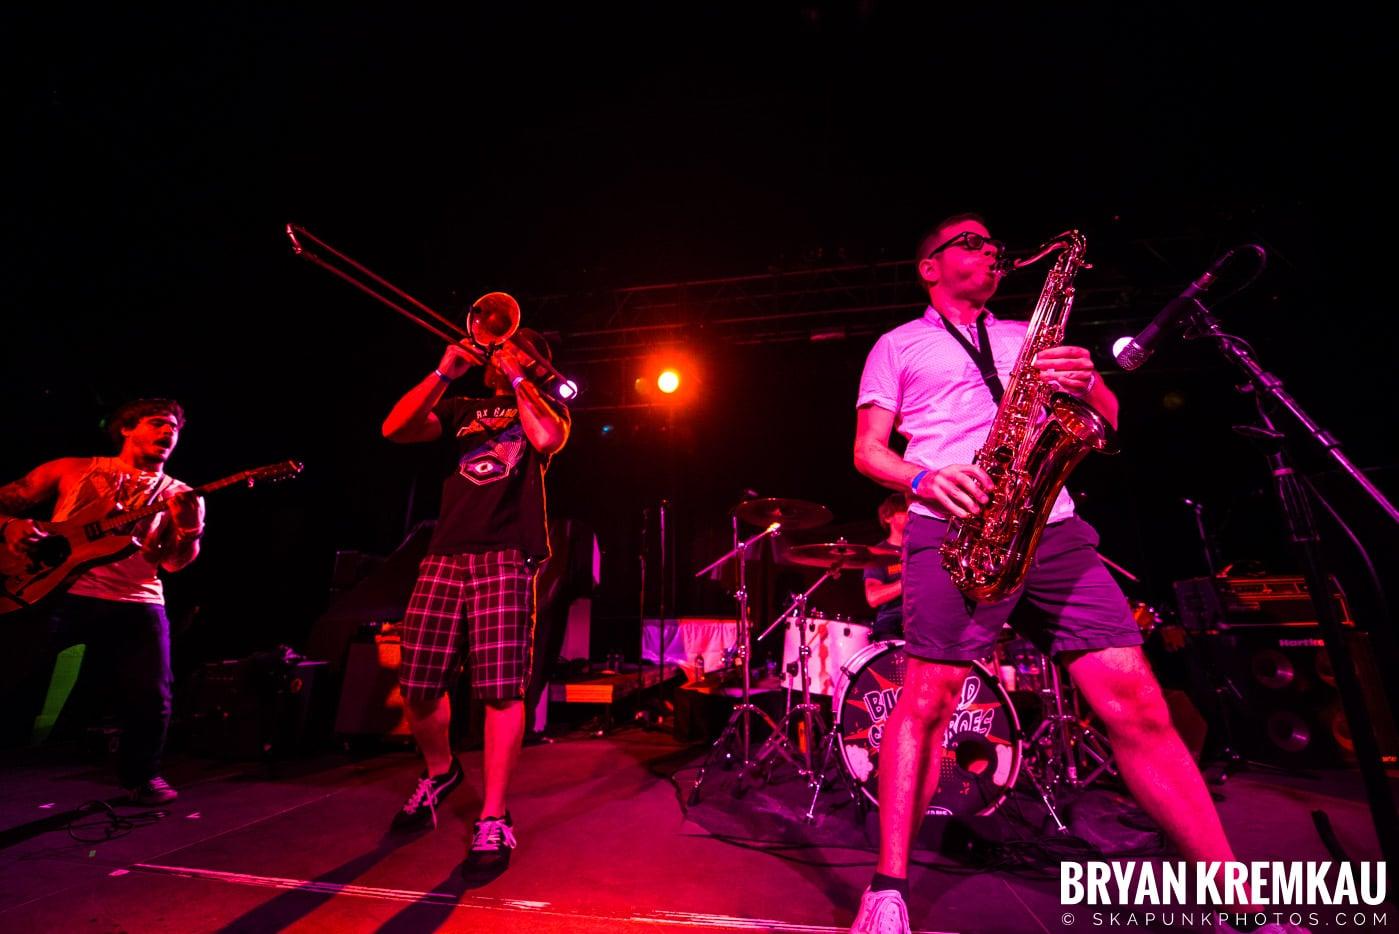 Backyard Superheroes @ Starland Ballroom, Sayreville, NJ - 7.29.17 (14)